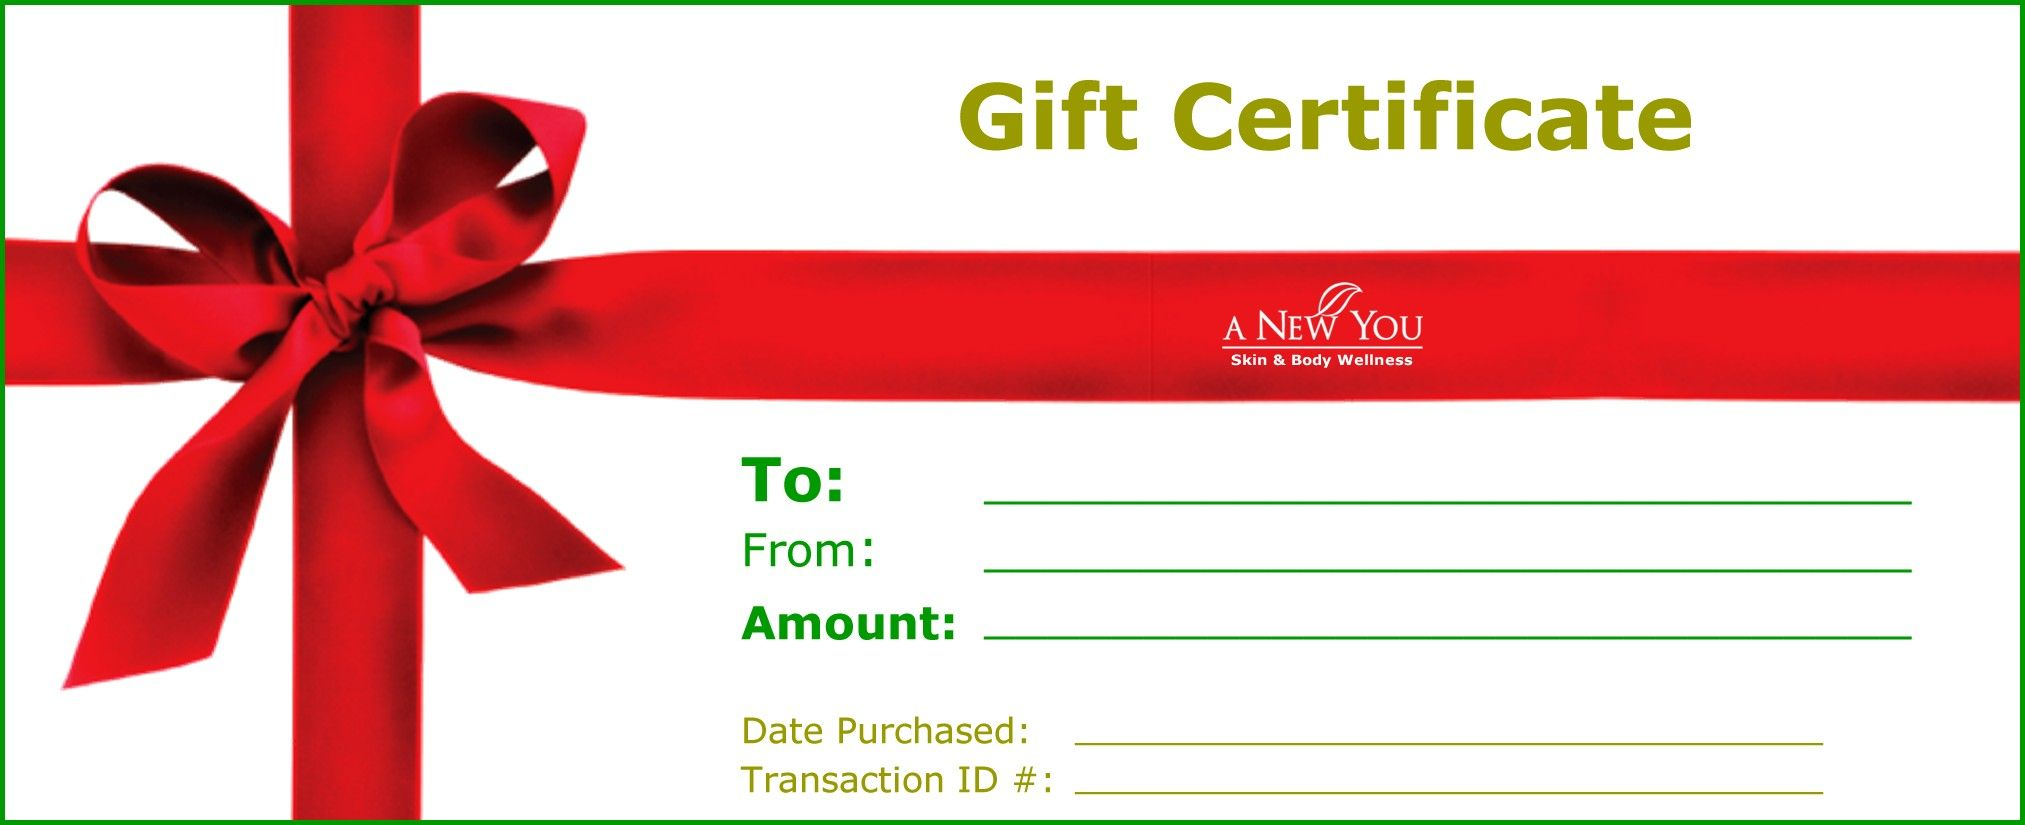 General Store Gift Certificate Http Www Wallwritten Com Catal Gift Certificate Template Christmas Gift Certificate Template Free Gift Certificate Template